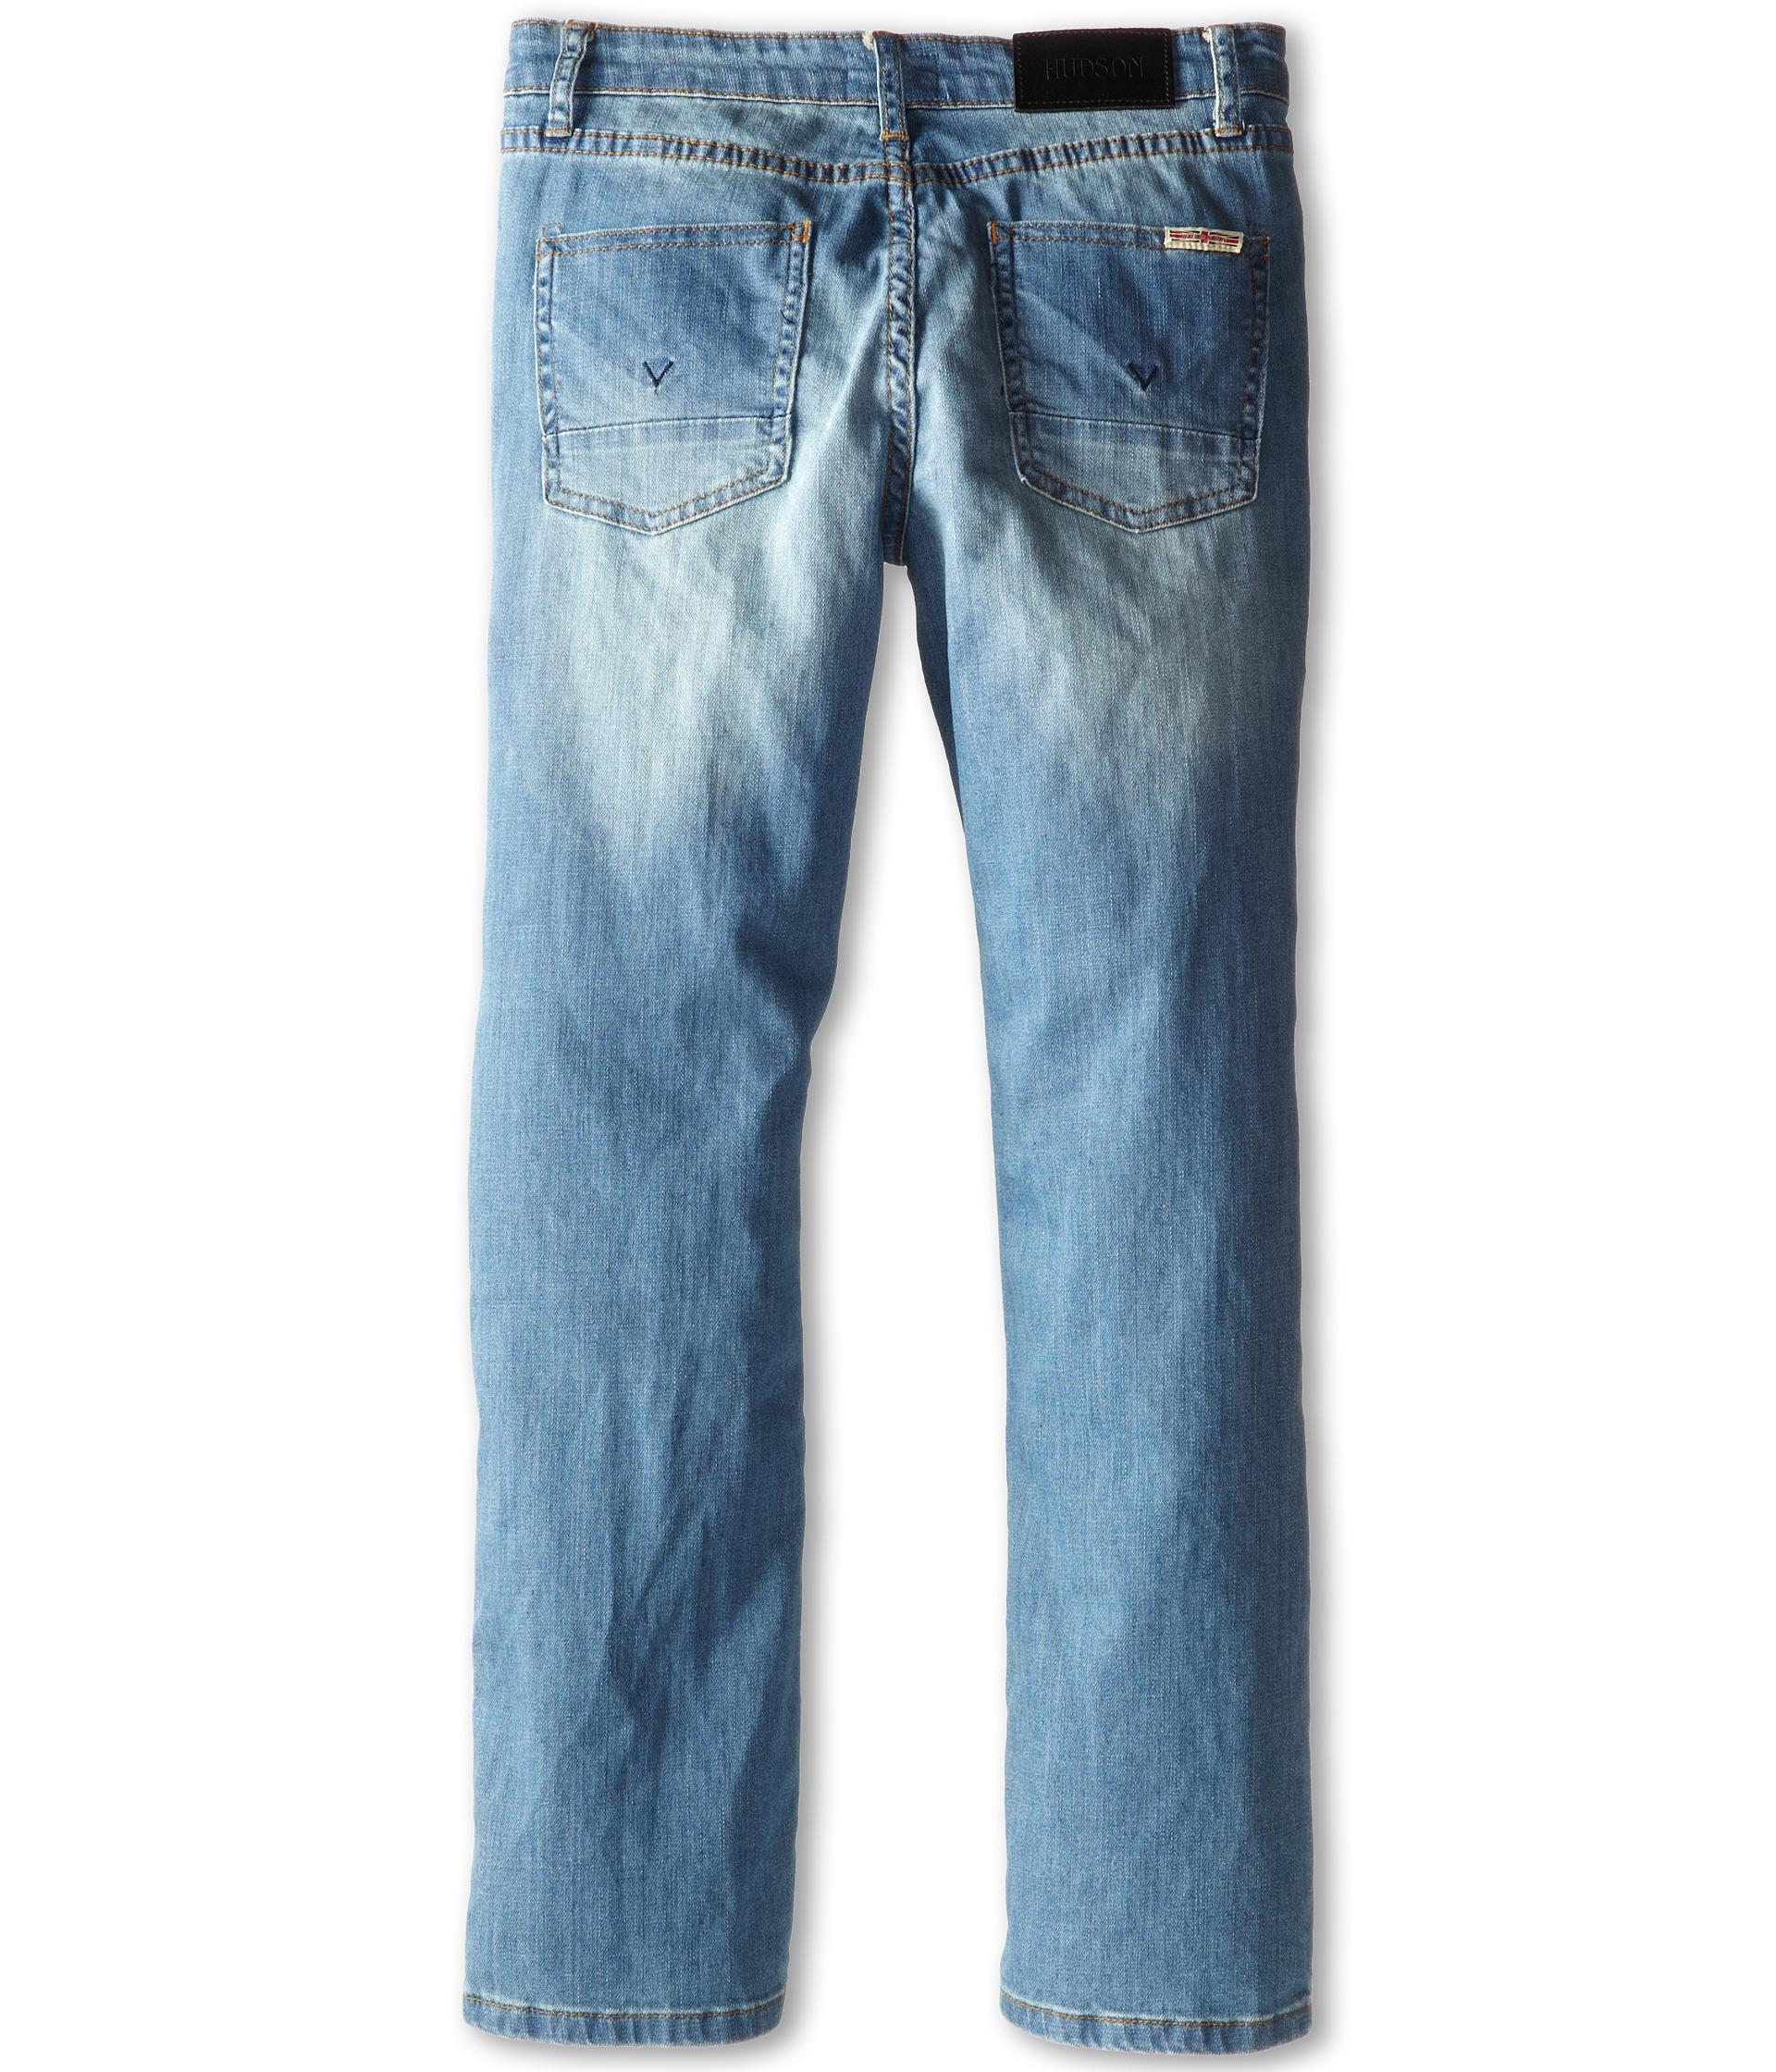 jeans depth of - photo #14